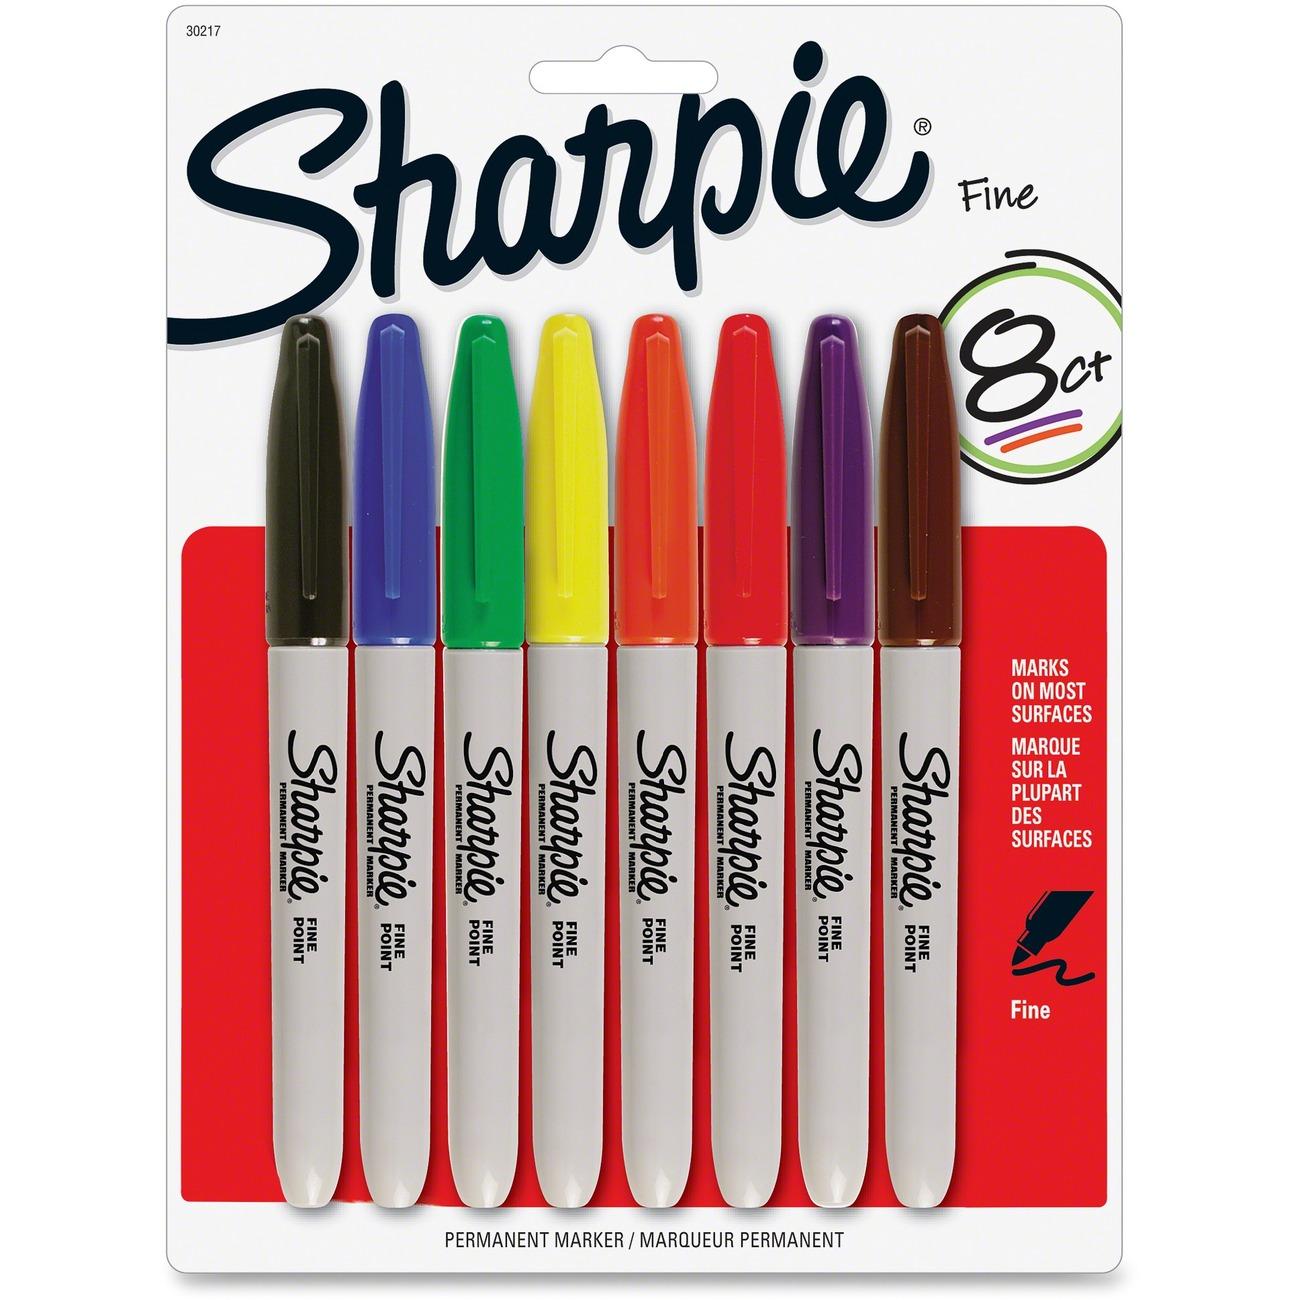 Sharpie Permanet Marker Assorted Ink san30217 Fine Marker Point Type 8 //